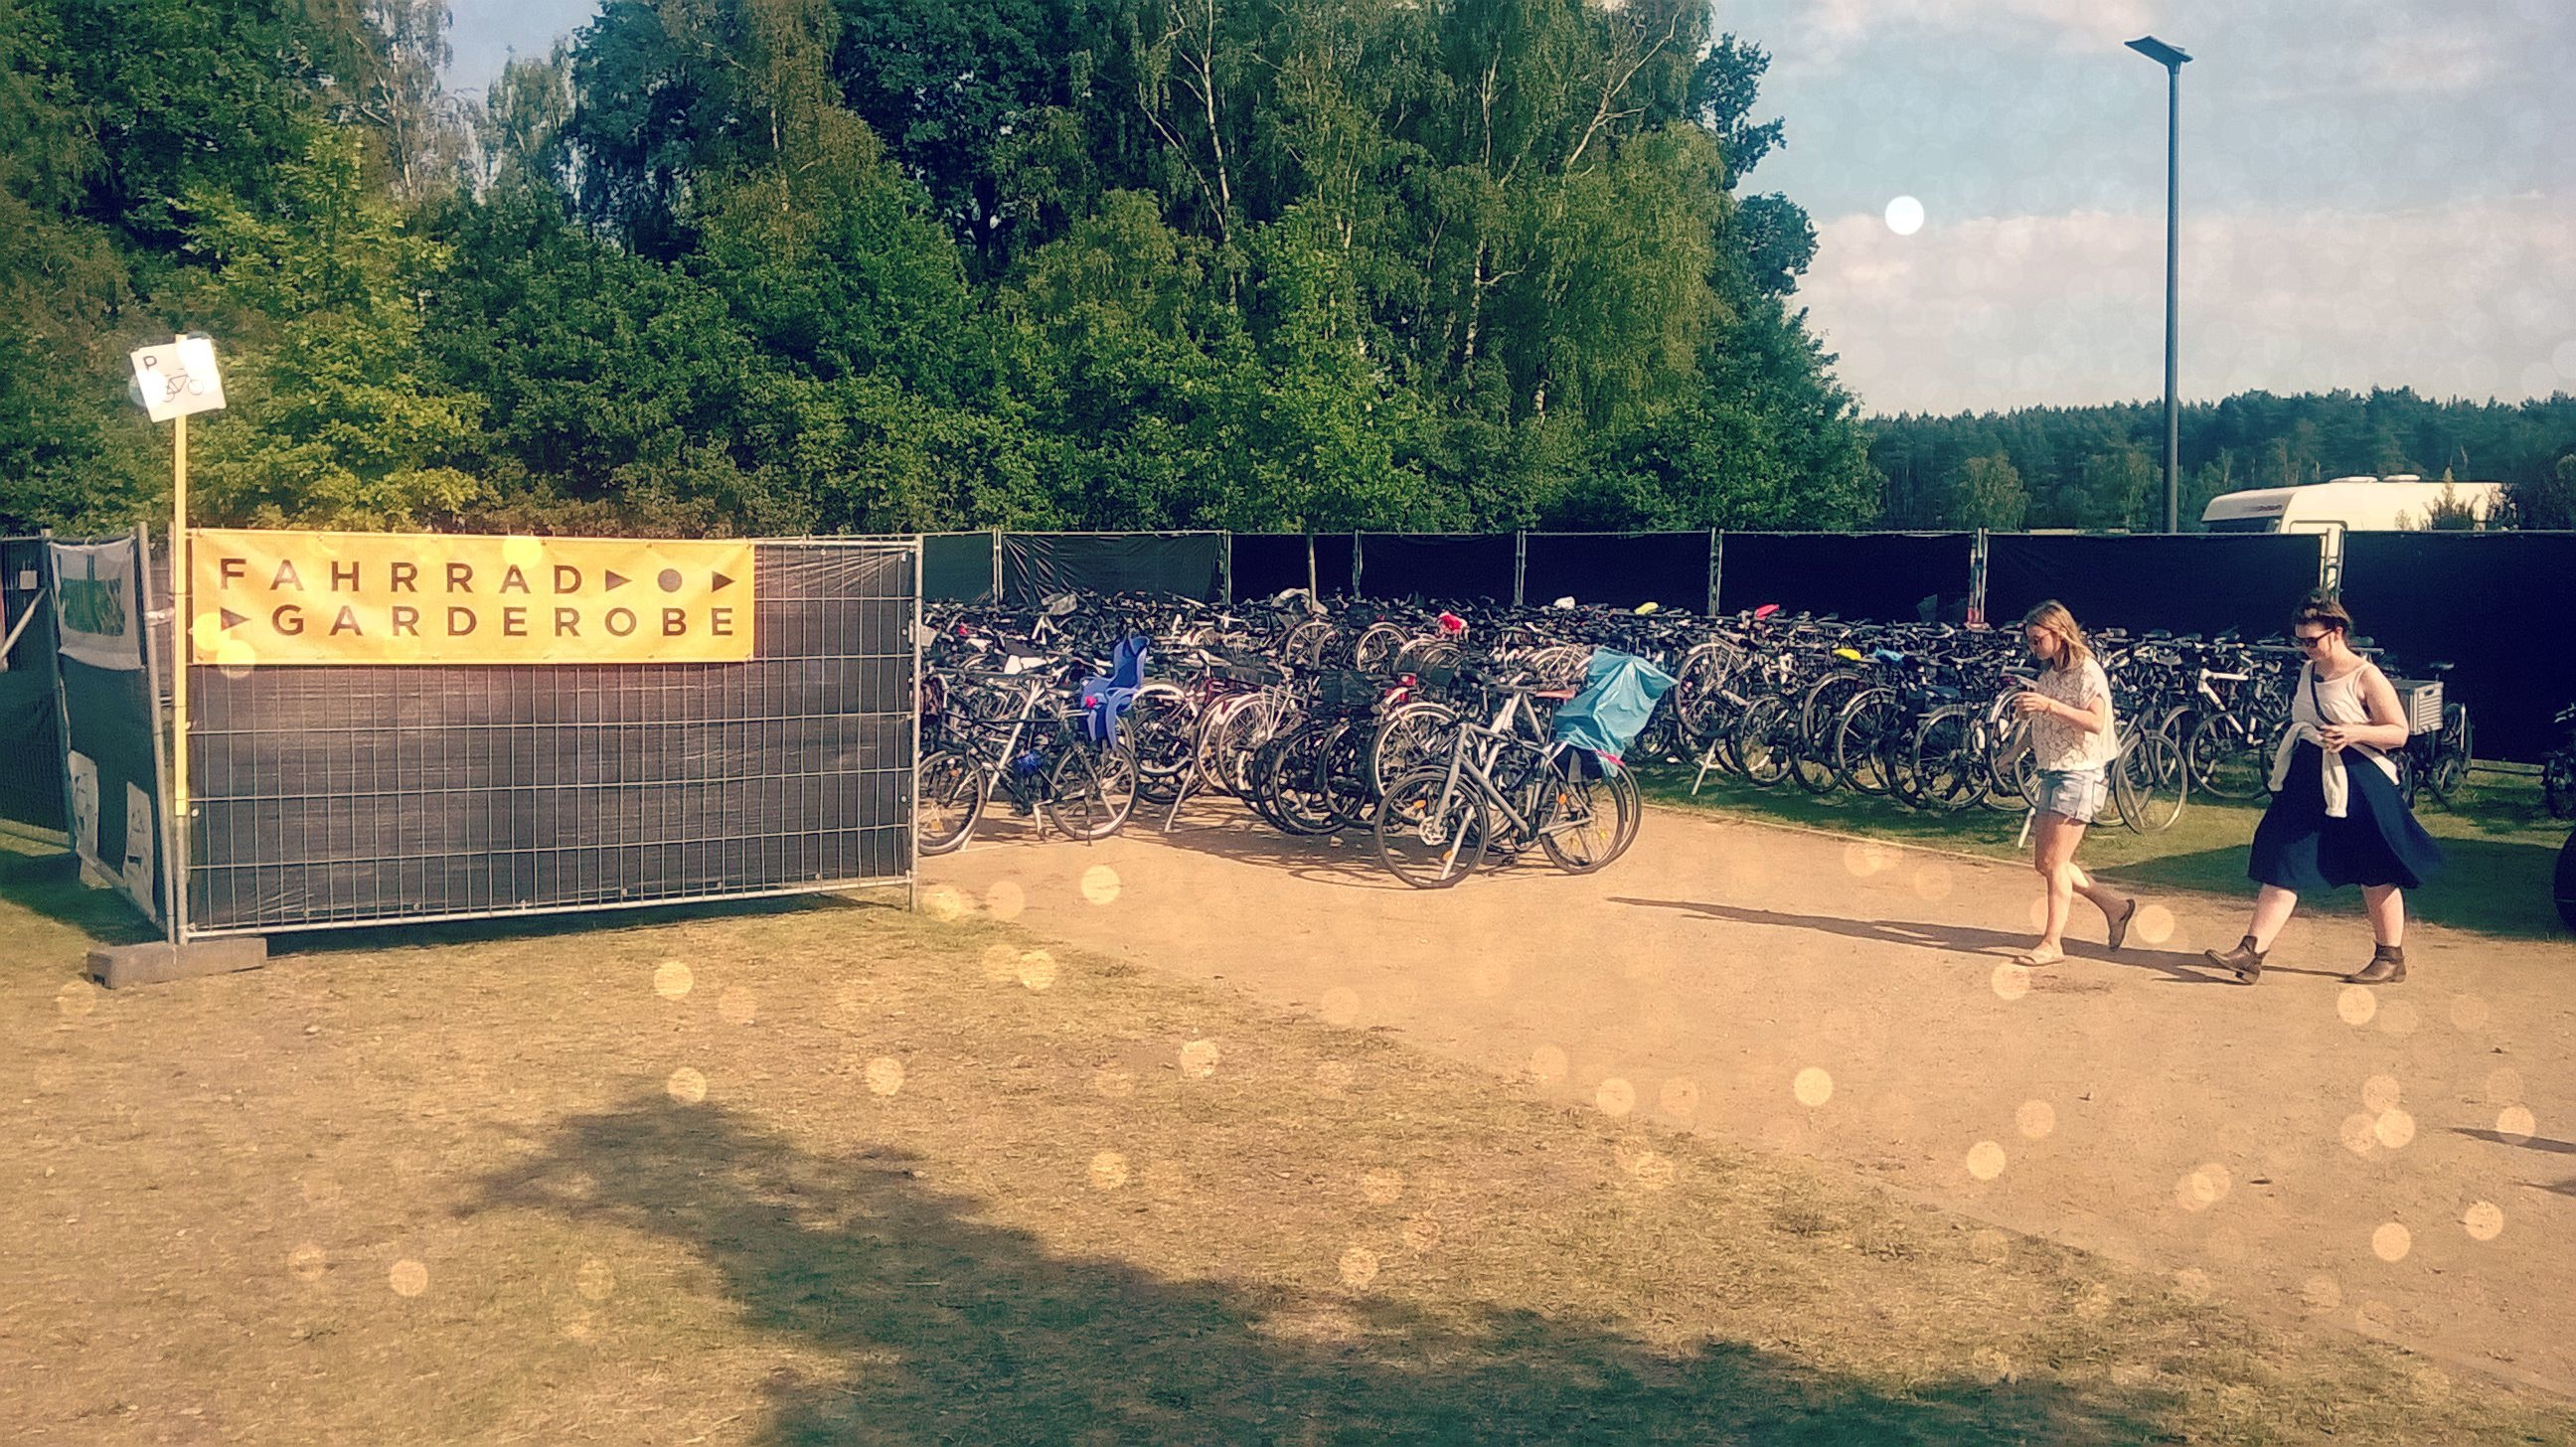 FahrradGarderobe_beim_A_Summers_Tale_Festival_3.jpg